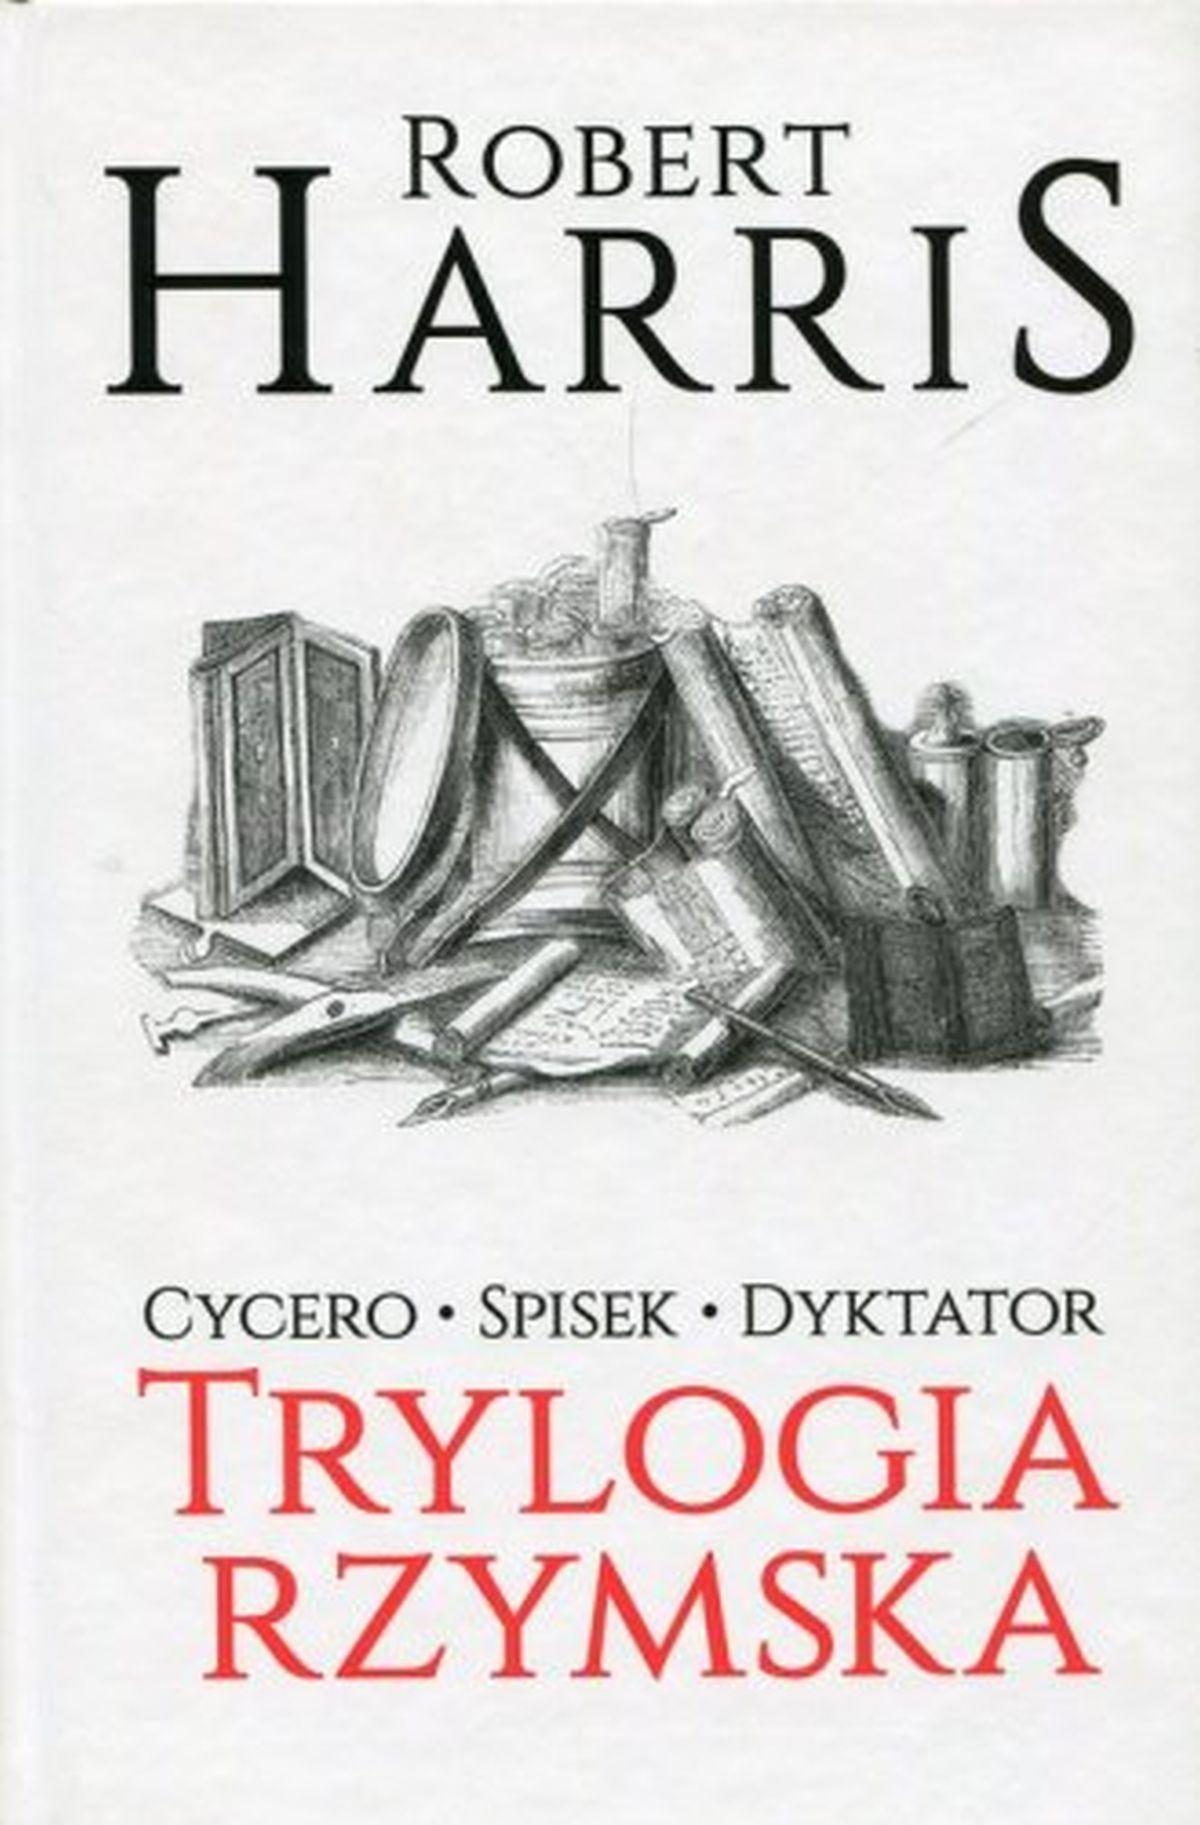 Robert Harris, Trylogia rzymska. Cycero Spisek Dyktator